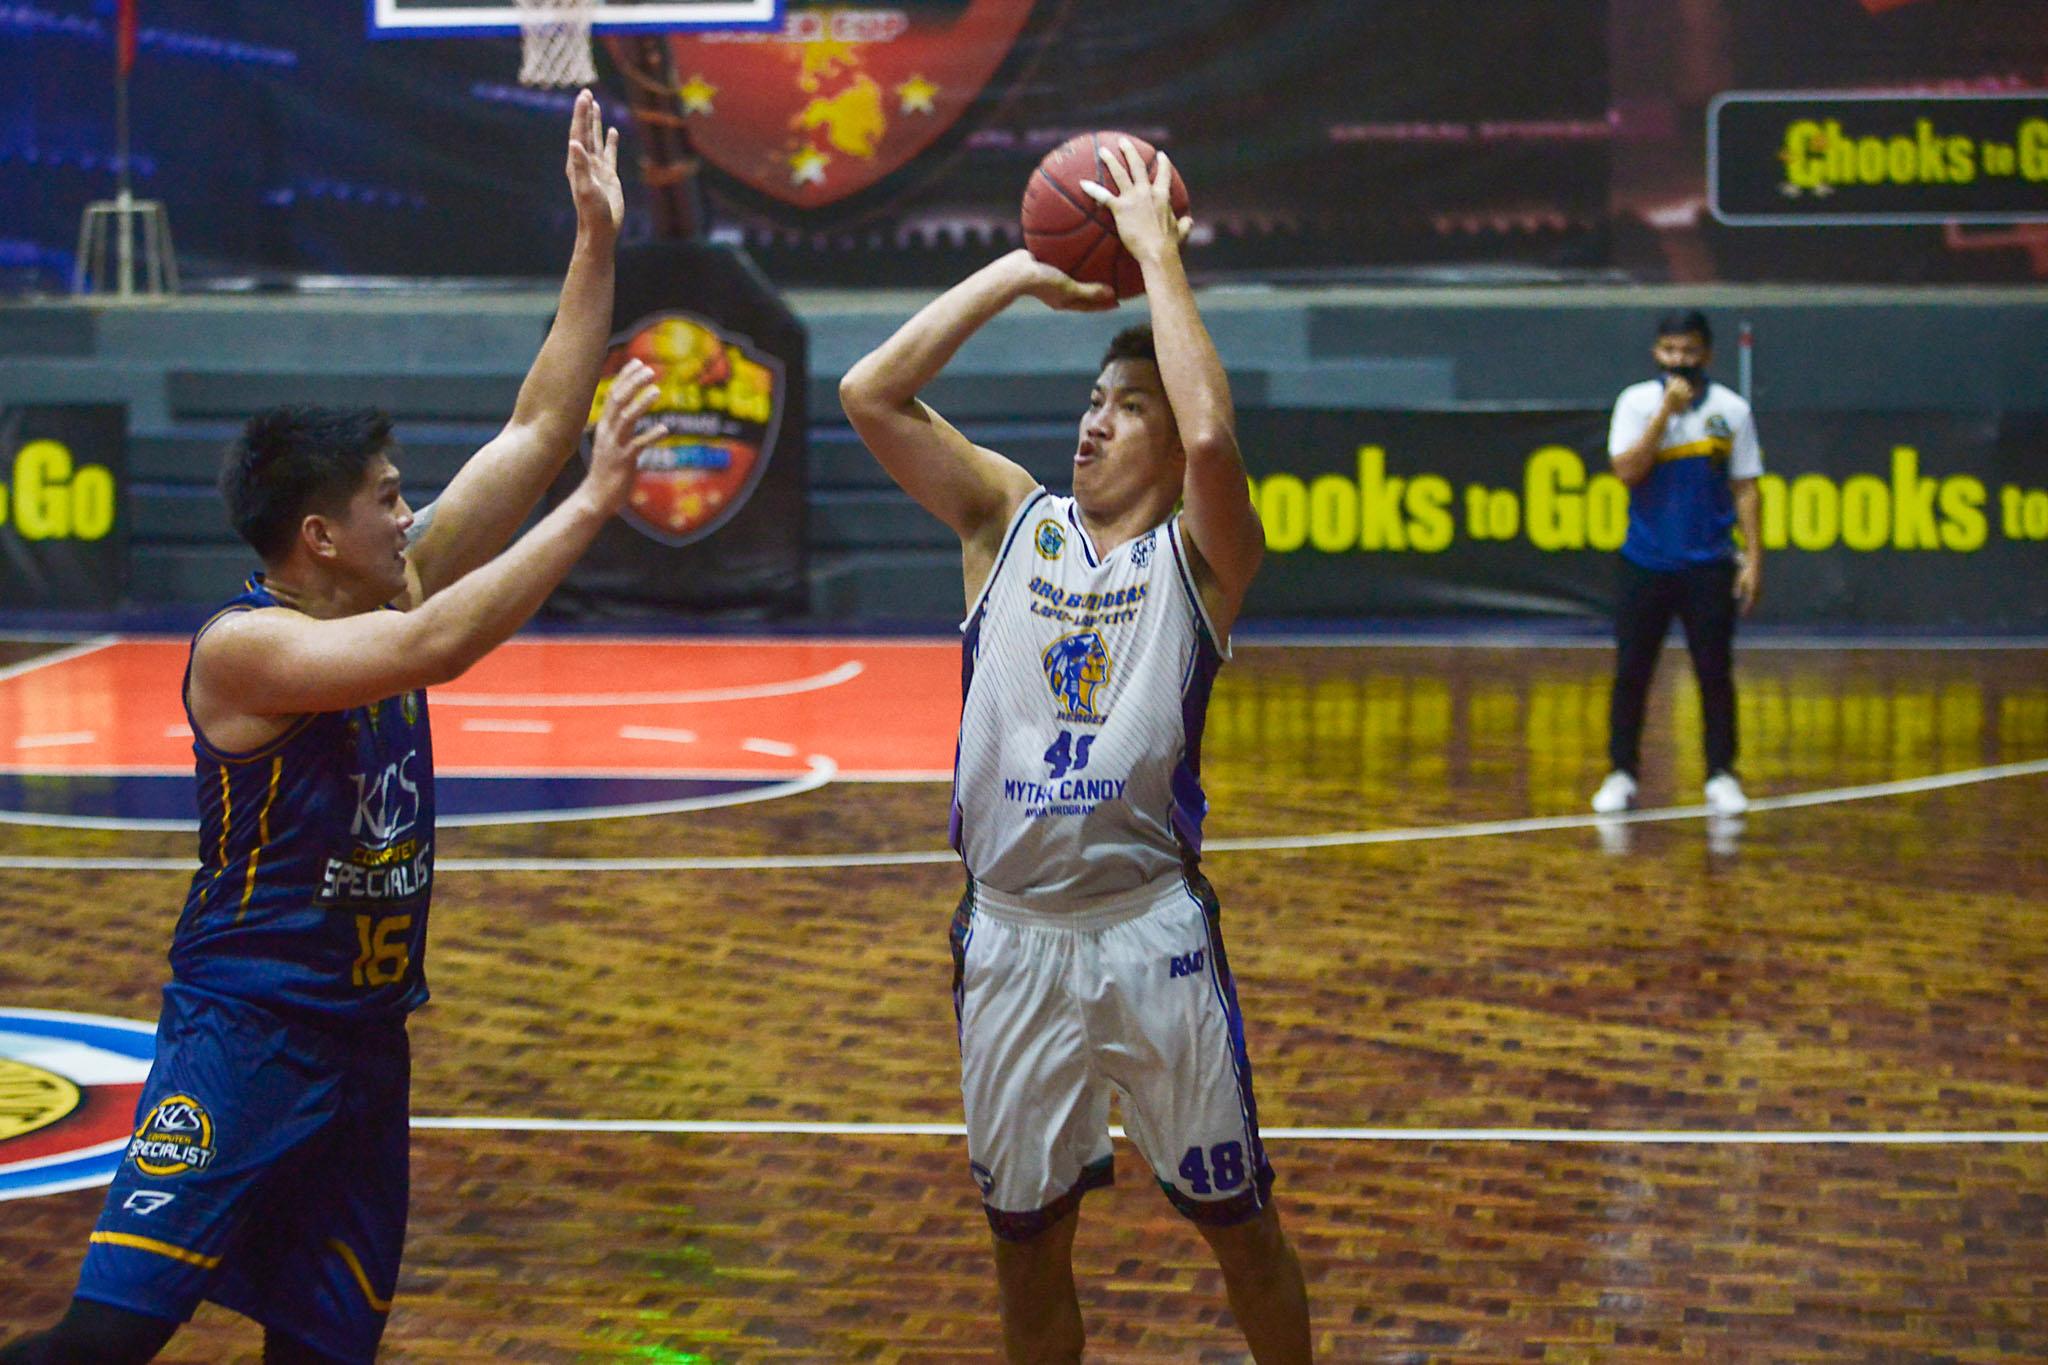 2021-Chooks-to-Go-VisMin-Cup-Visayas-semis-Mandaue-vs-Lapu-Lapu-Reed-Juntilla Reed Juntilla epitomizes ARQ Lapu-Lapu's 'never too late' mindset Basketball News VisMin Super Cup  - philippine sports news